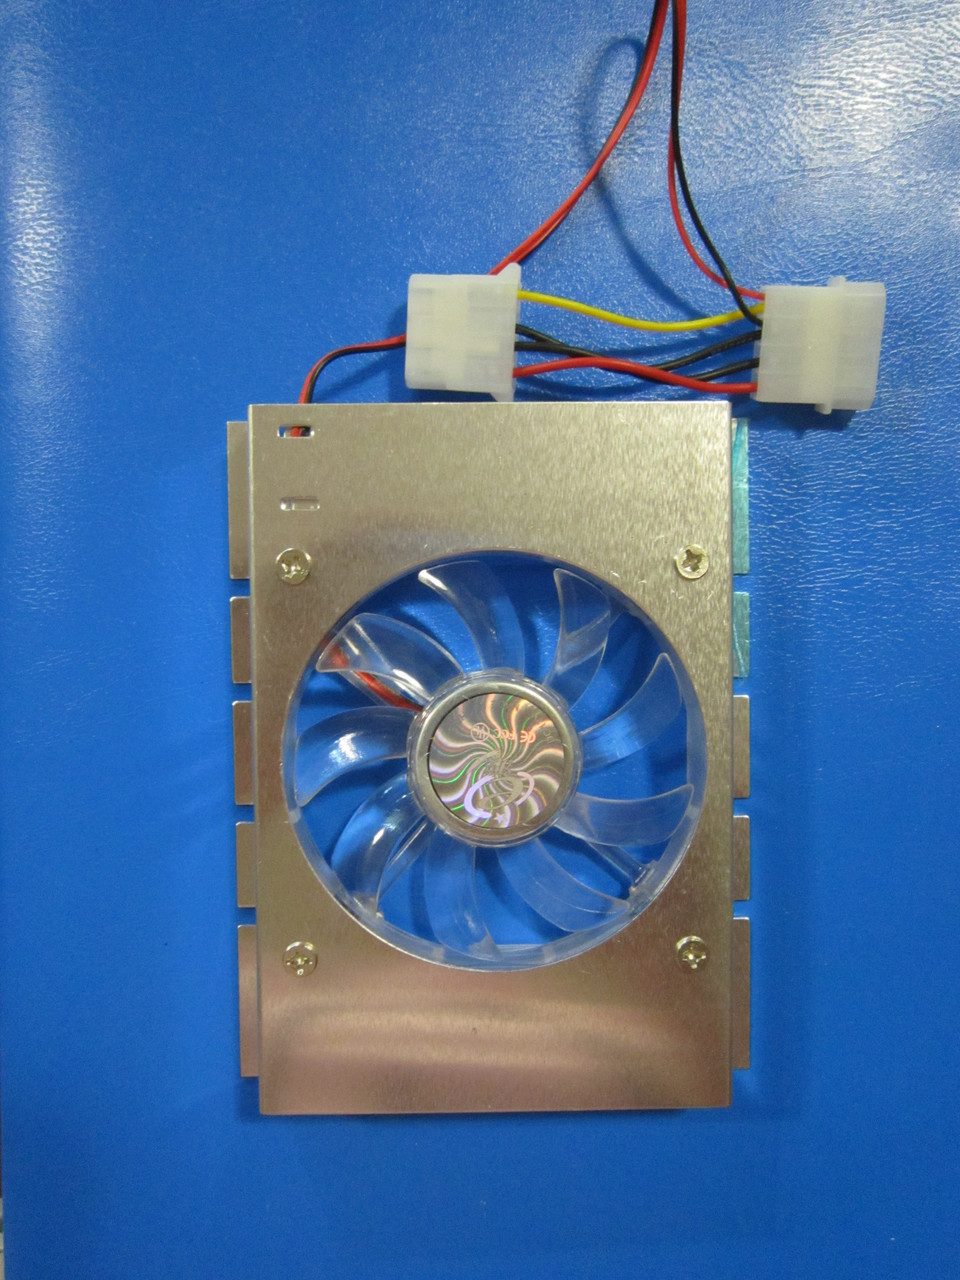 HDD disk cooler Теплоотвод для винчестера